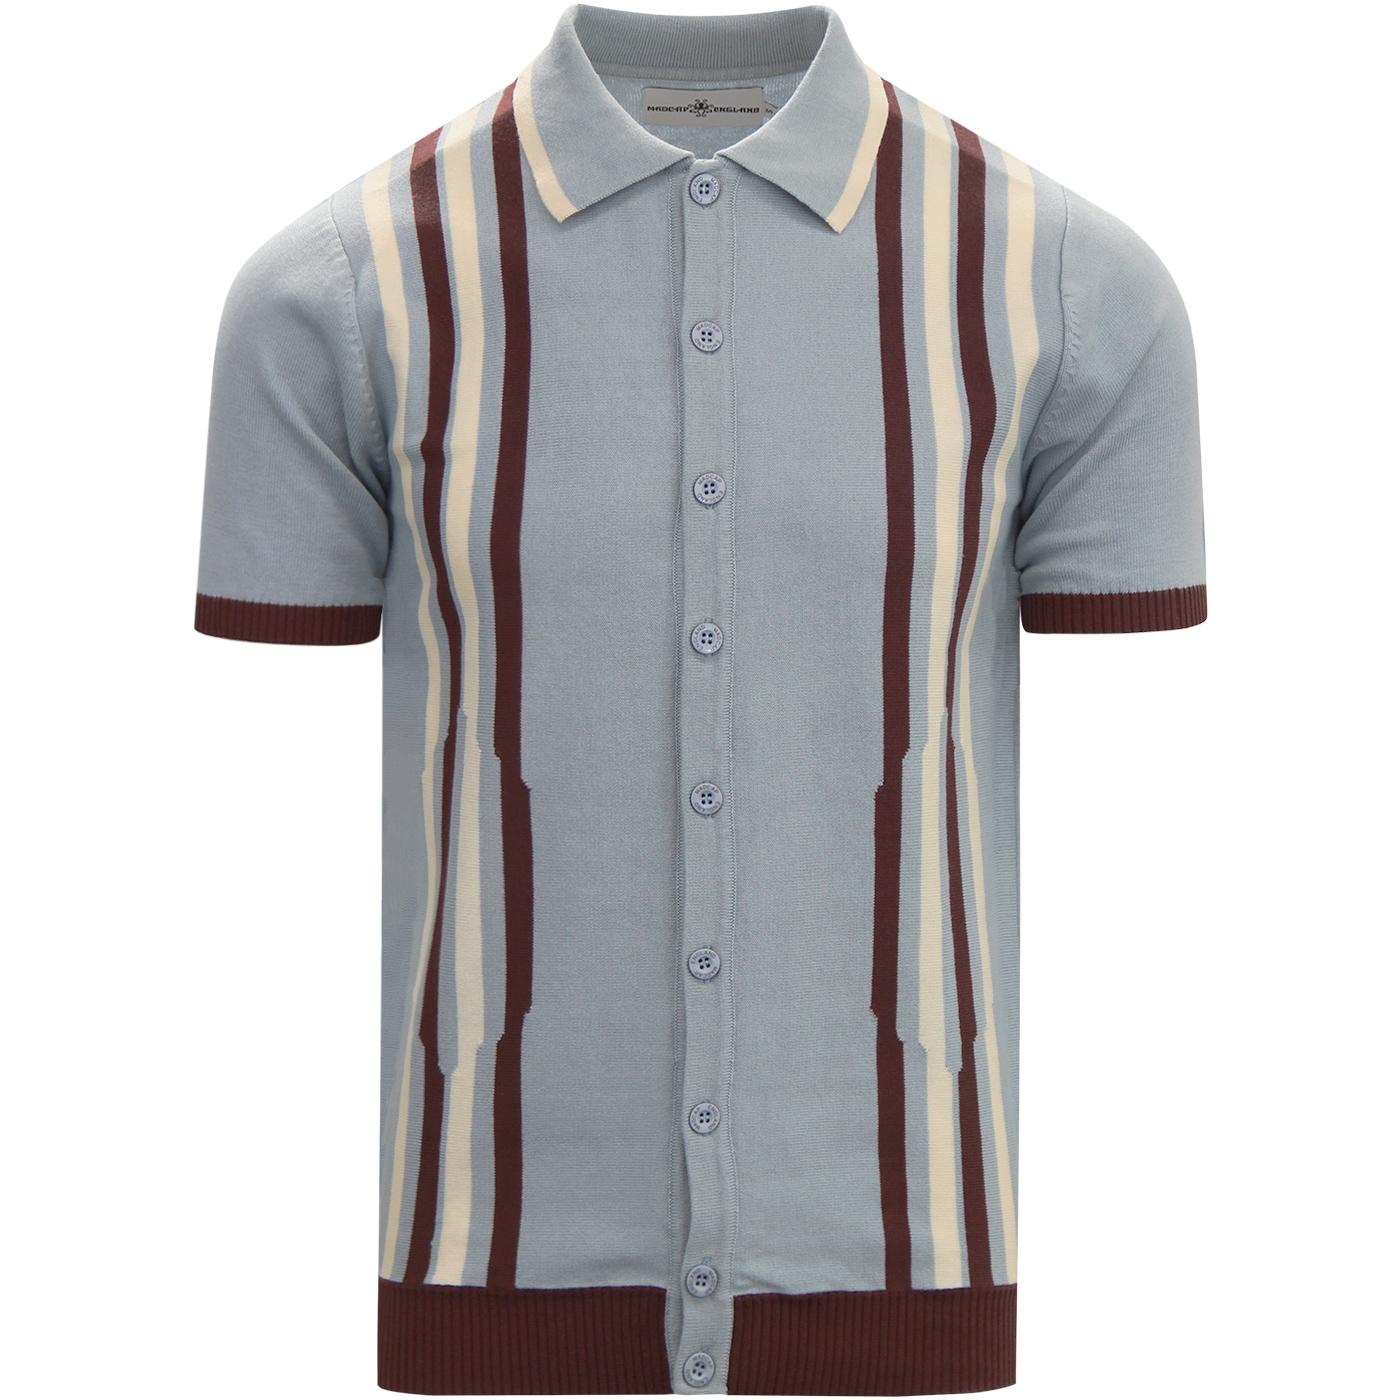 Shockwave MADCAP ENGLAND Mod Stripe Knit Polo Top